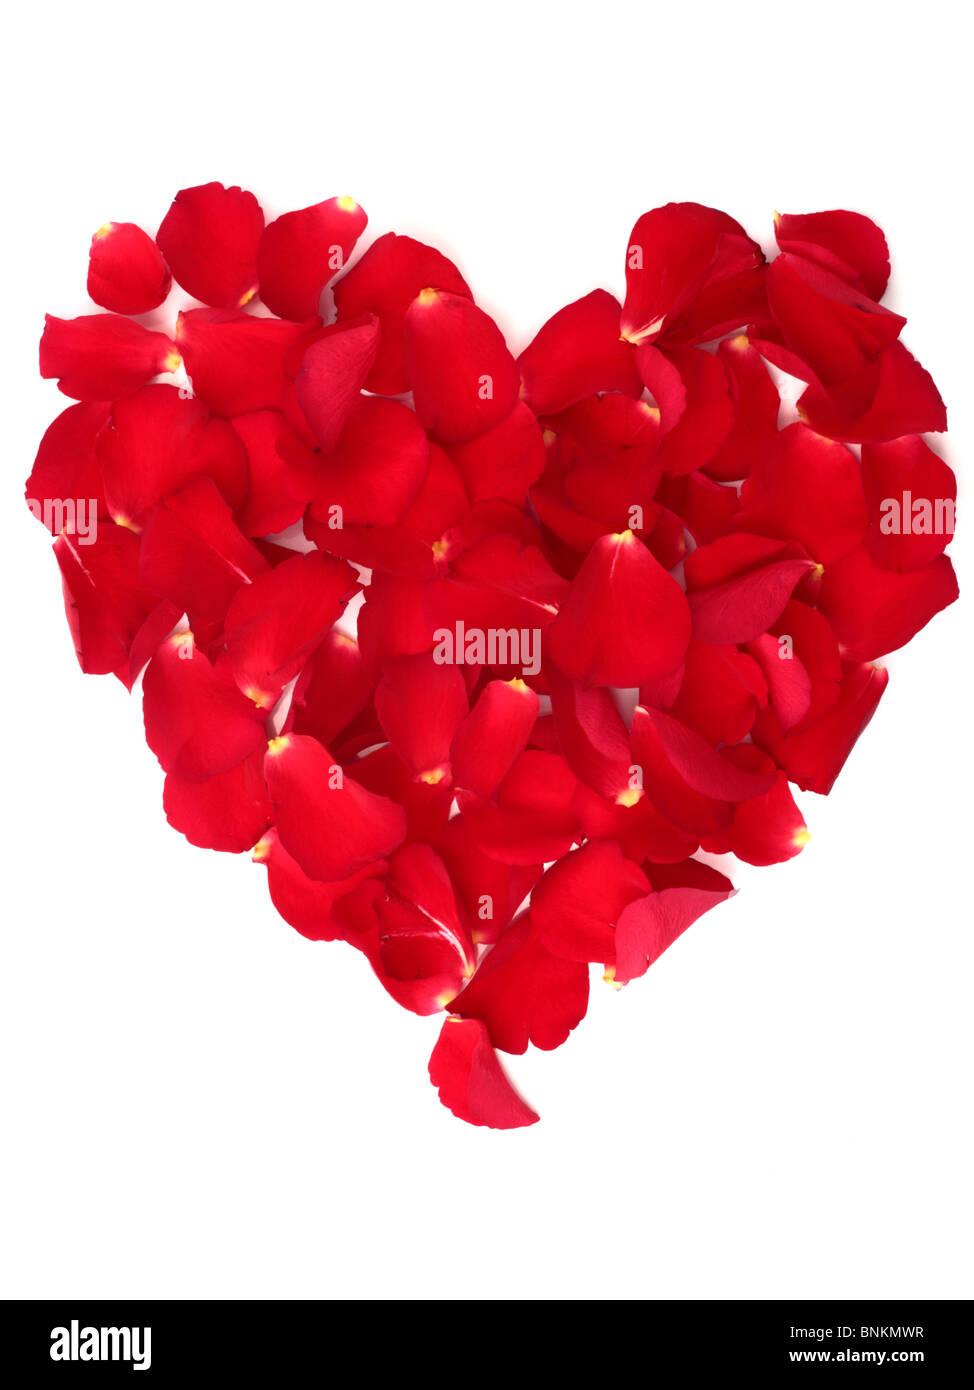 Red rose petal heart shape - Stock Image